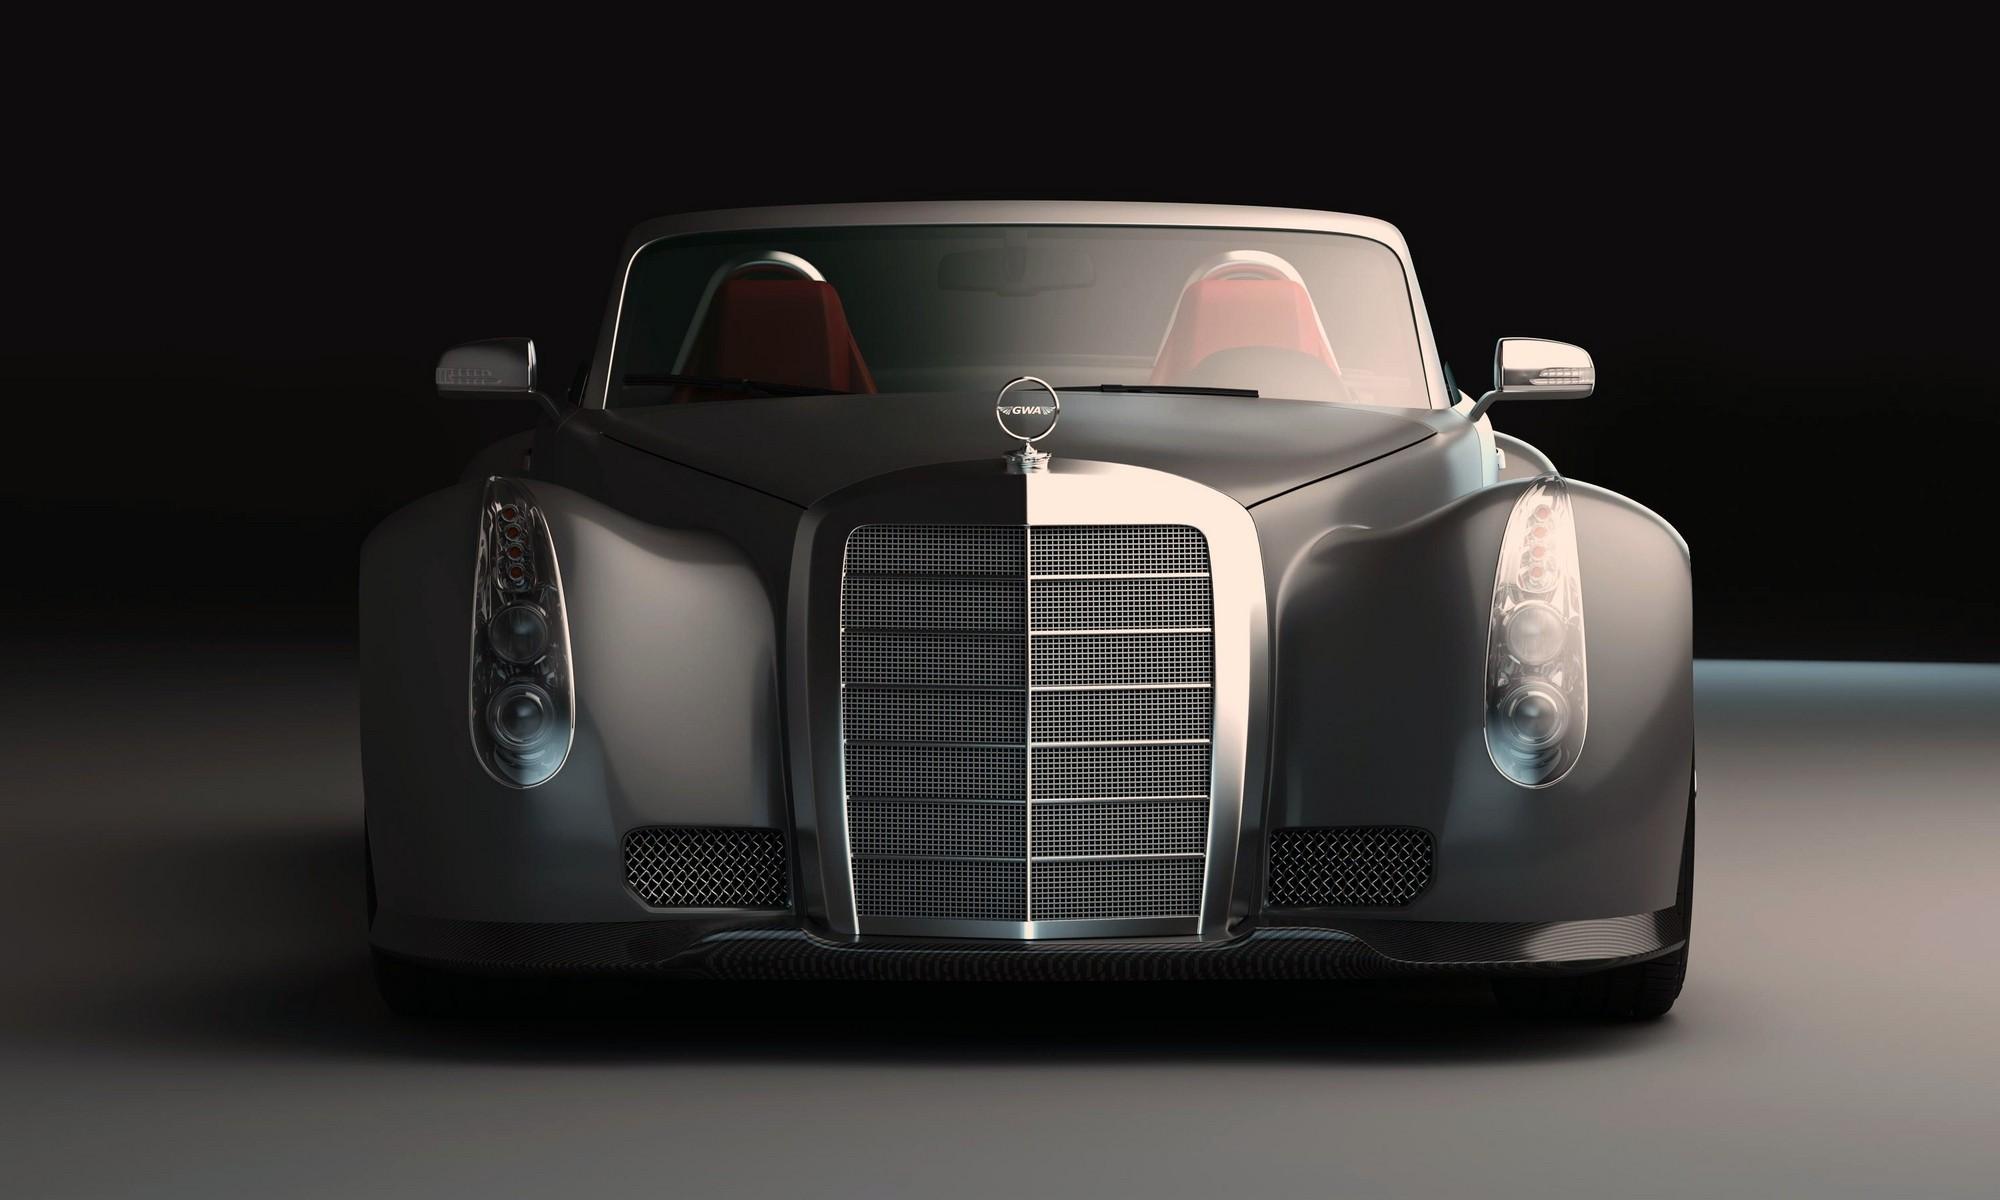 GWA Mercedes-Benz 300SLC front